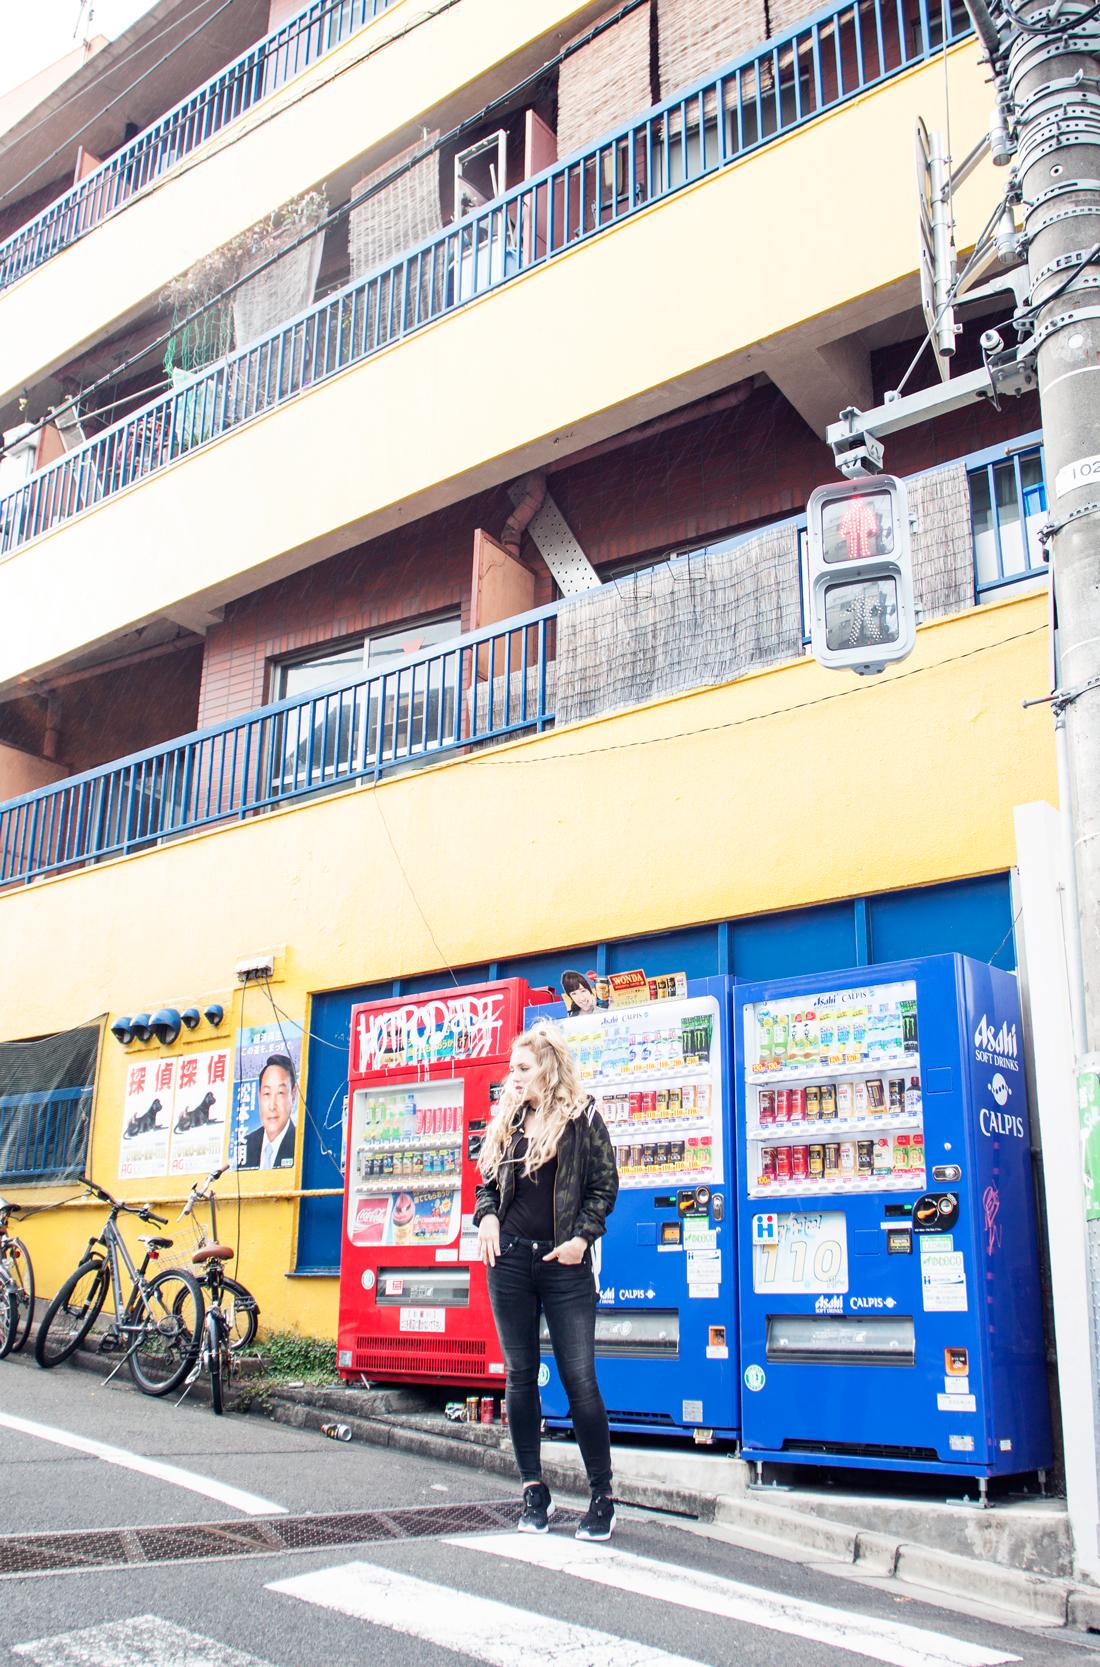 vending machine shibuya, vending machine japan, vending machine tokyo, rainy tokyo, sunny tokyo, camouflage bomber jacket, rapunzel clip in extensions, shibuya streets, travel blog, tokyo blog